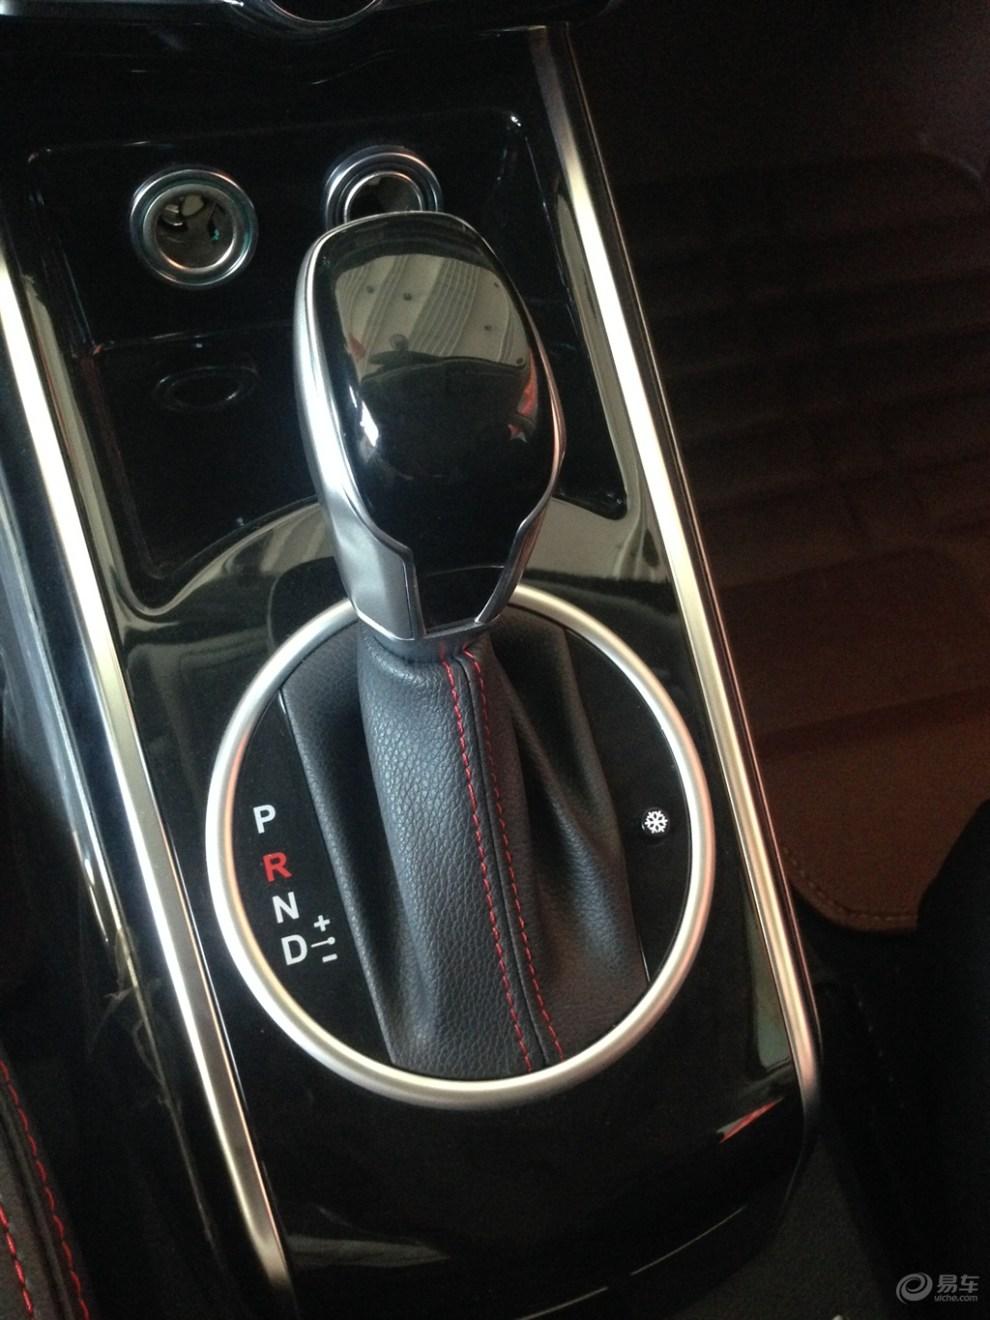 【X55座自动挡技巧v技巧棉衣】_大迈X5宝宝图如何用秋衣车型做论坛图片